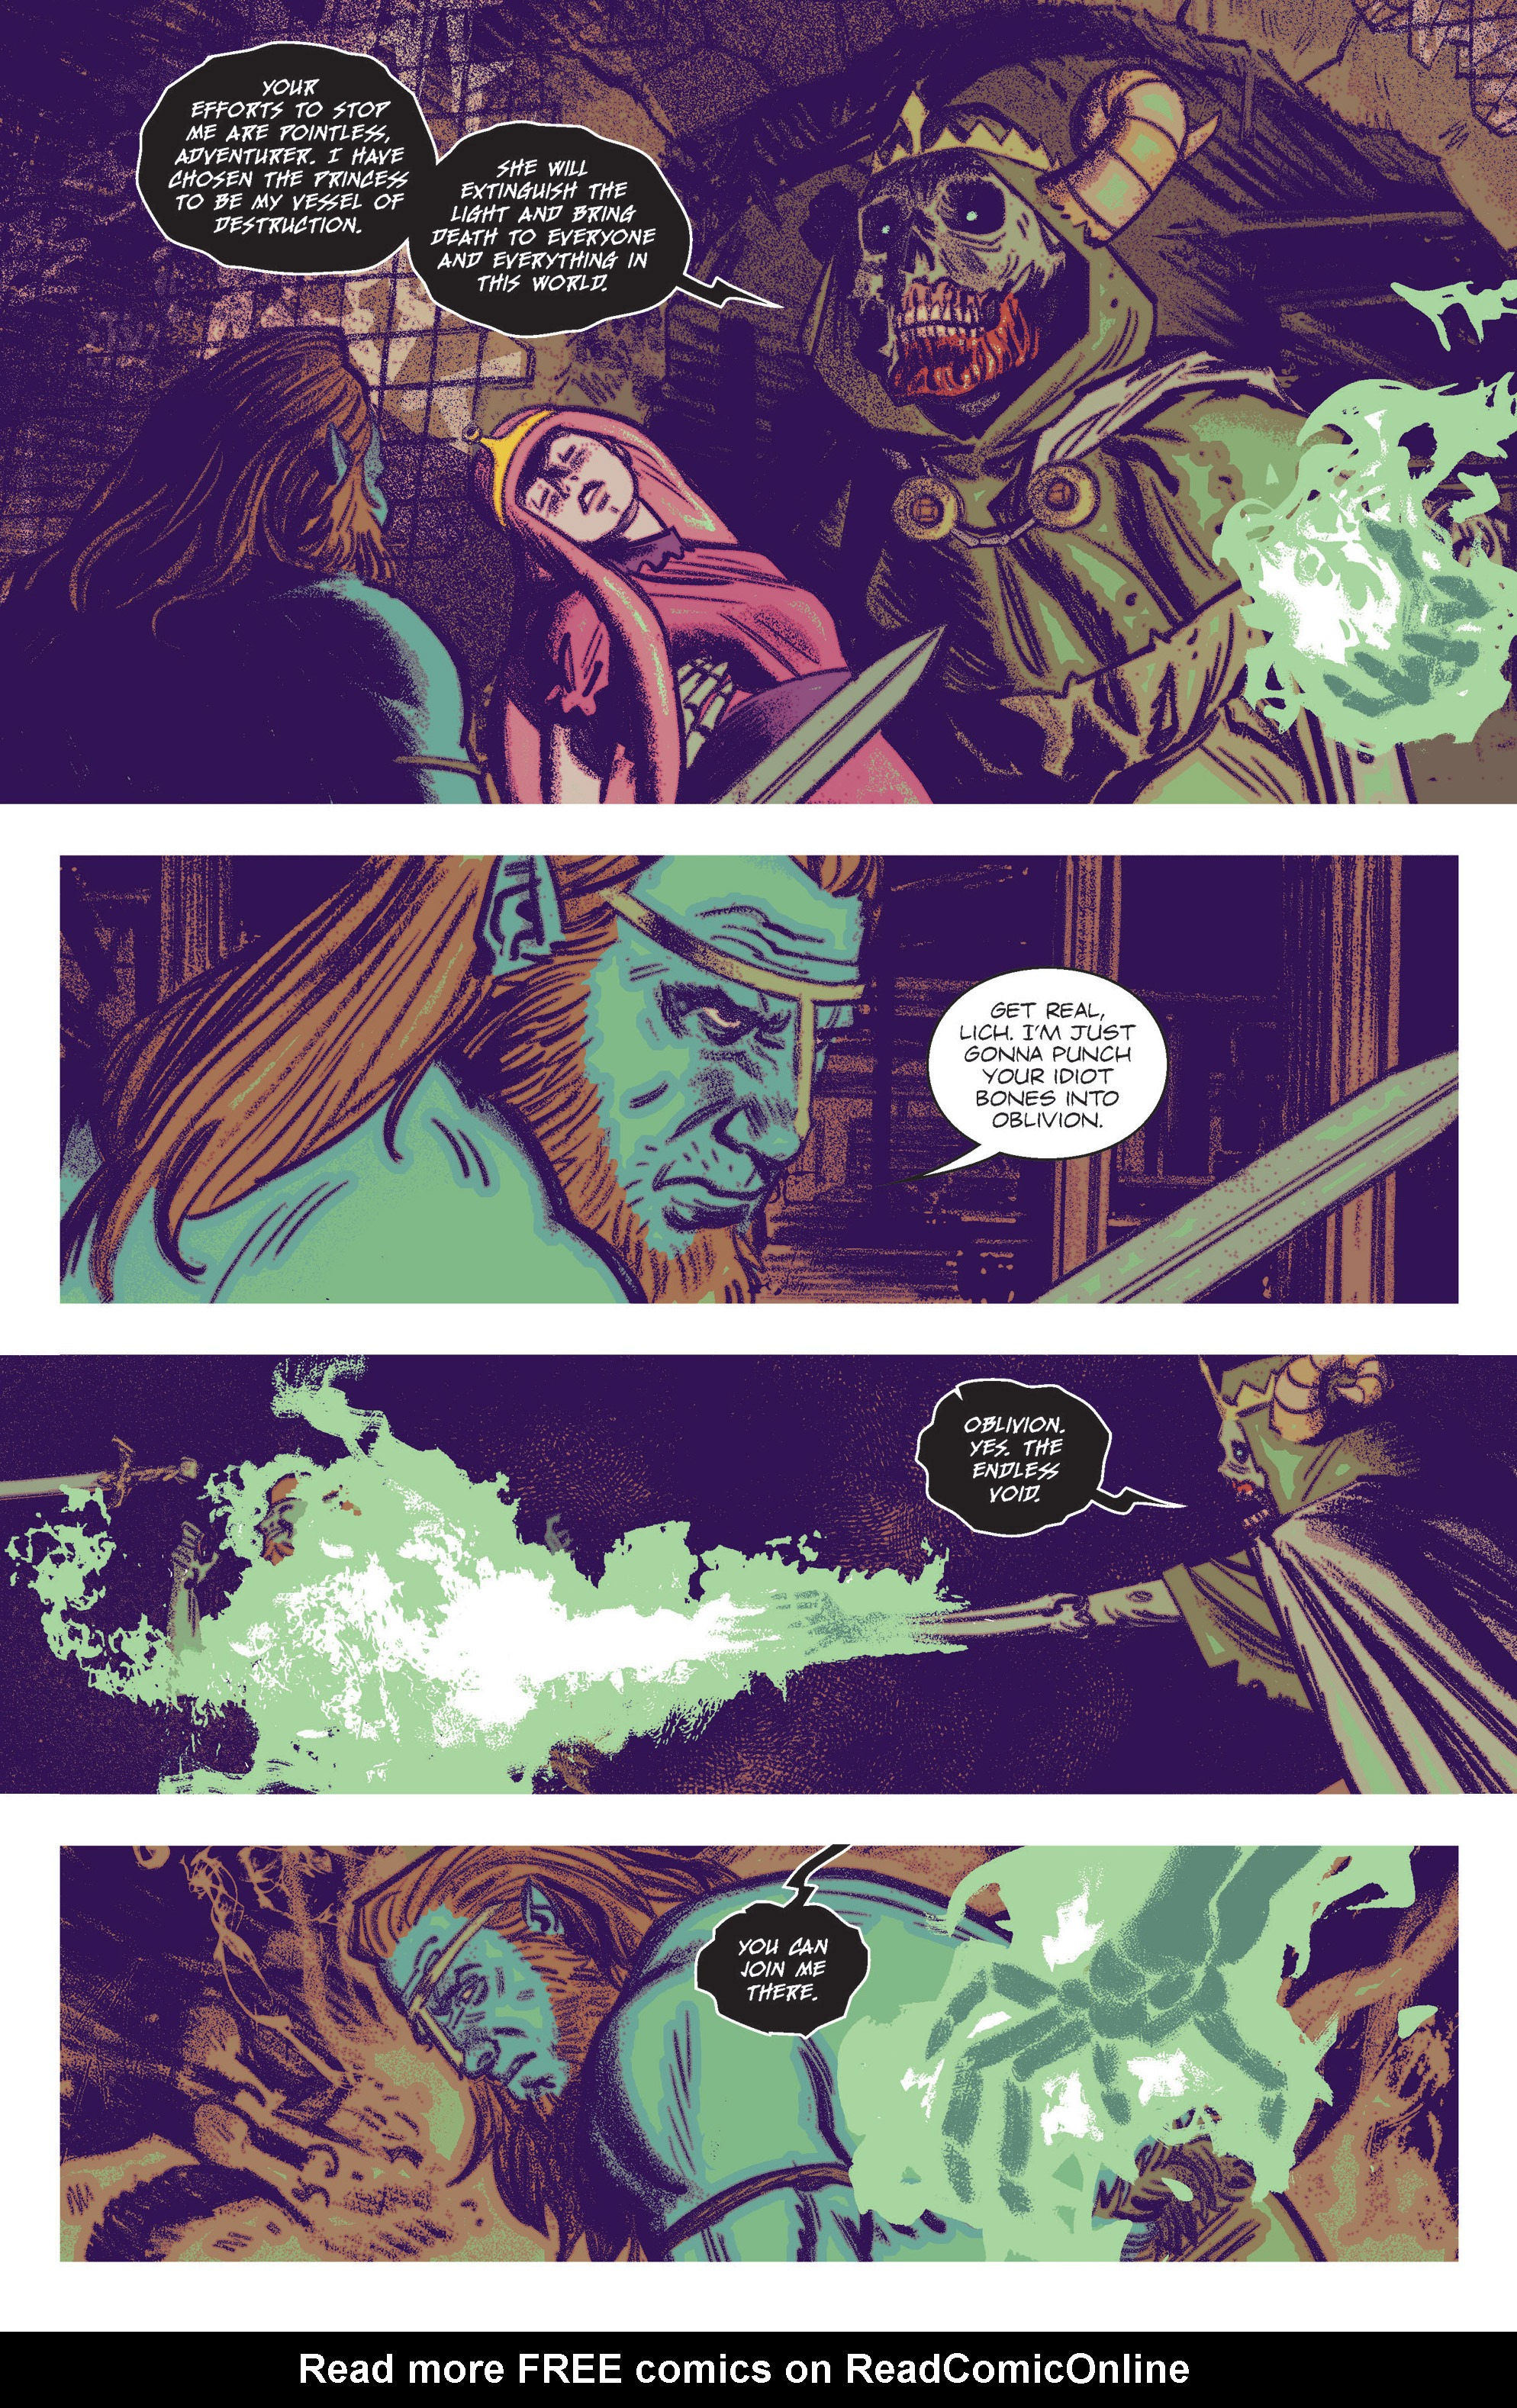 Read online Adventure Time Comics comic -  Issue #2 - 11